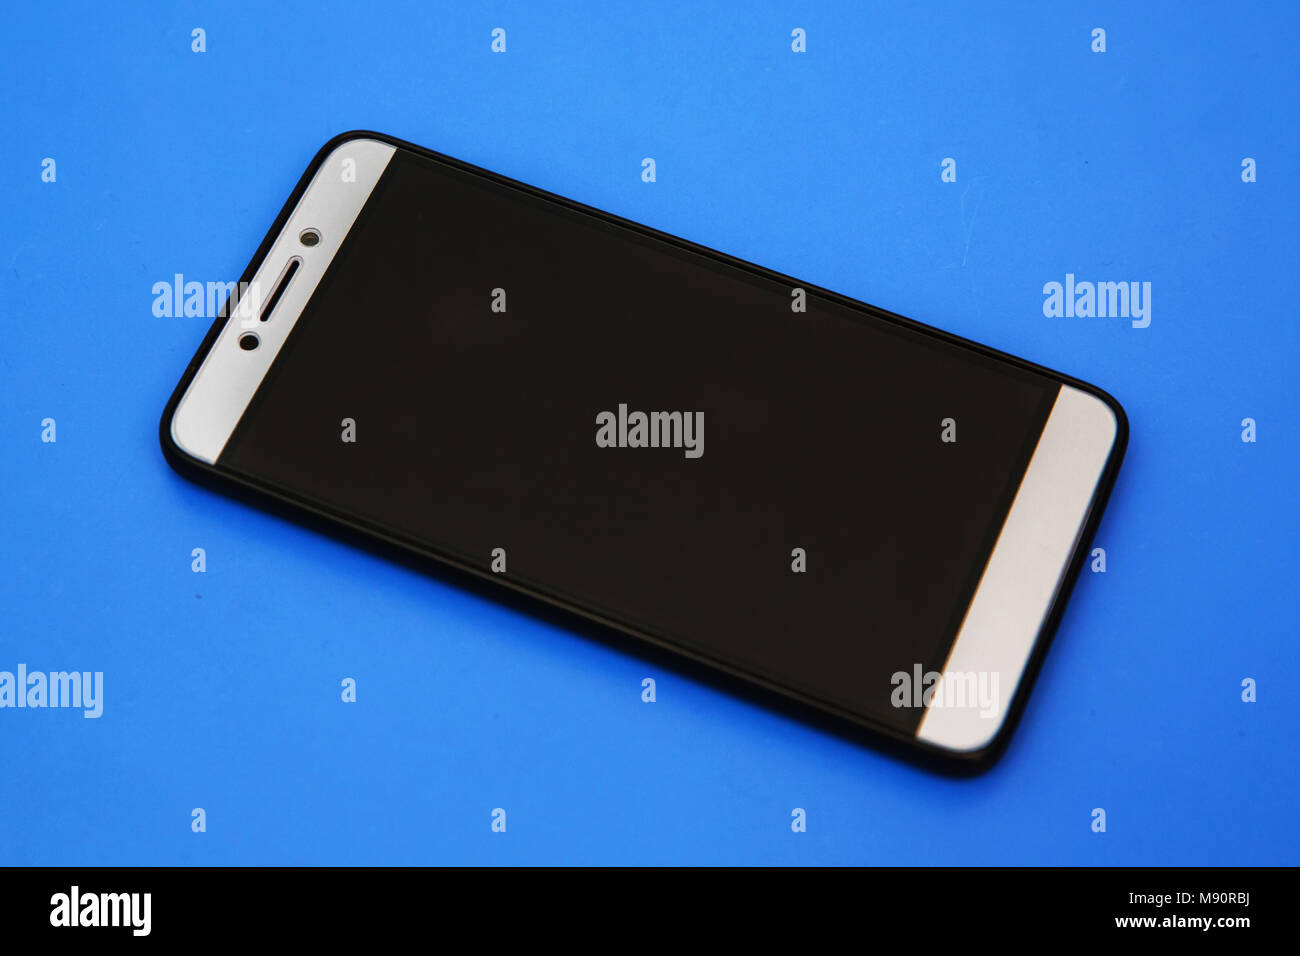 Black mobile smart phone mock up. This smartphone mock-up isolated on blue background. black smartphone with black screen. Android mobile phone . Can  Stock Photo